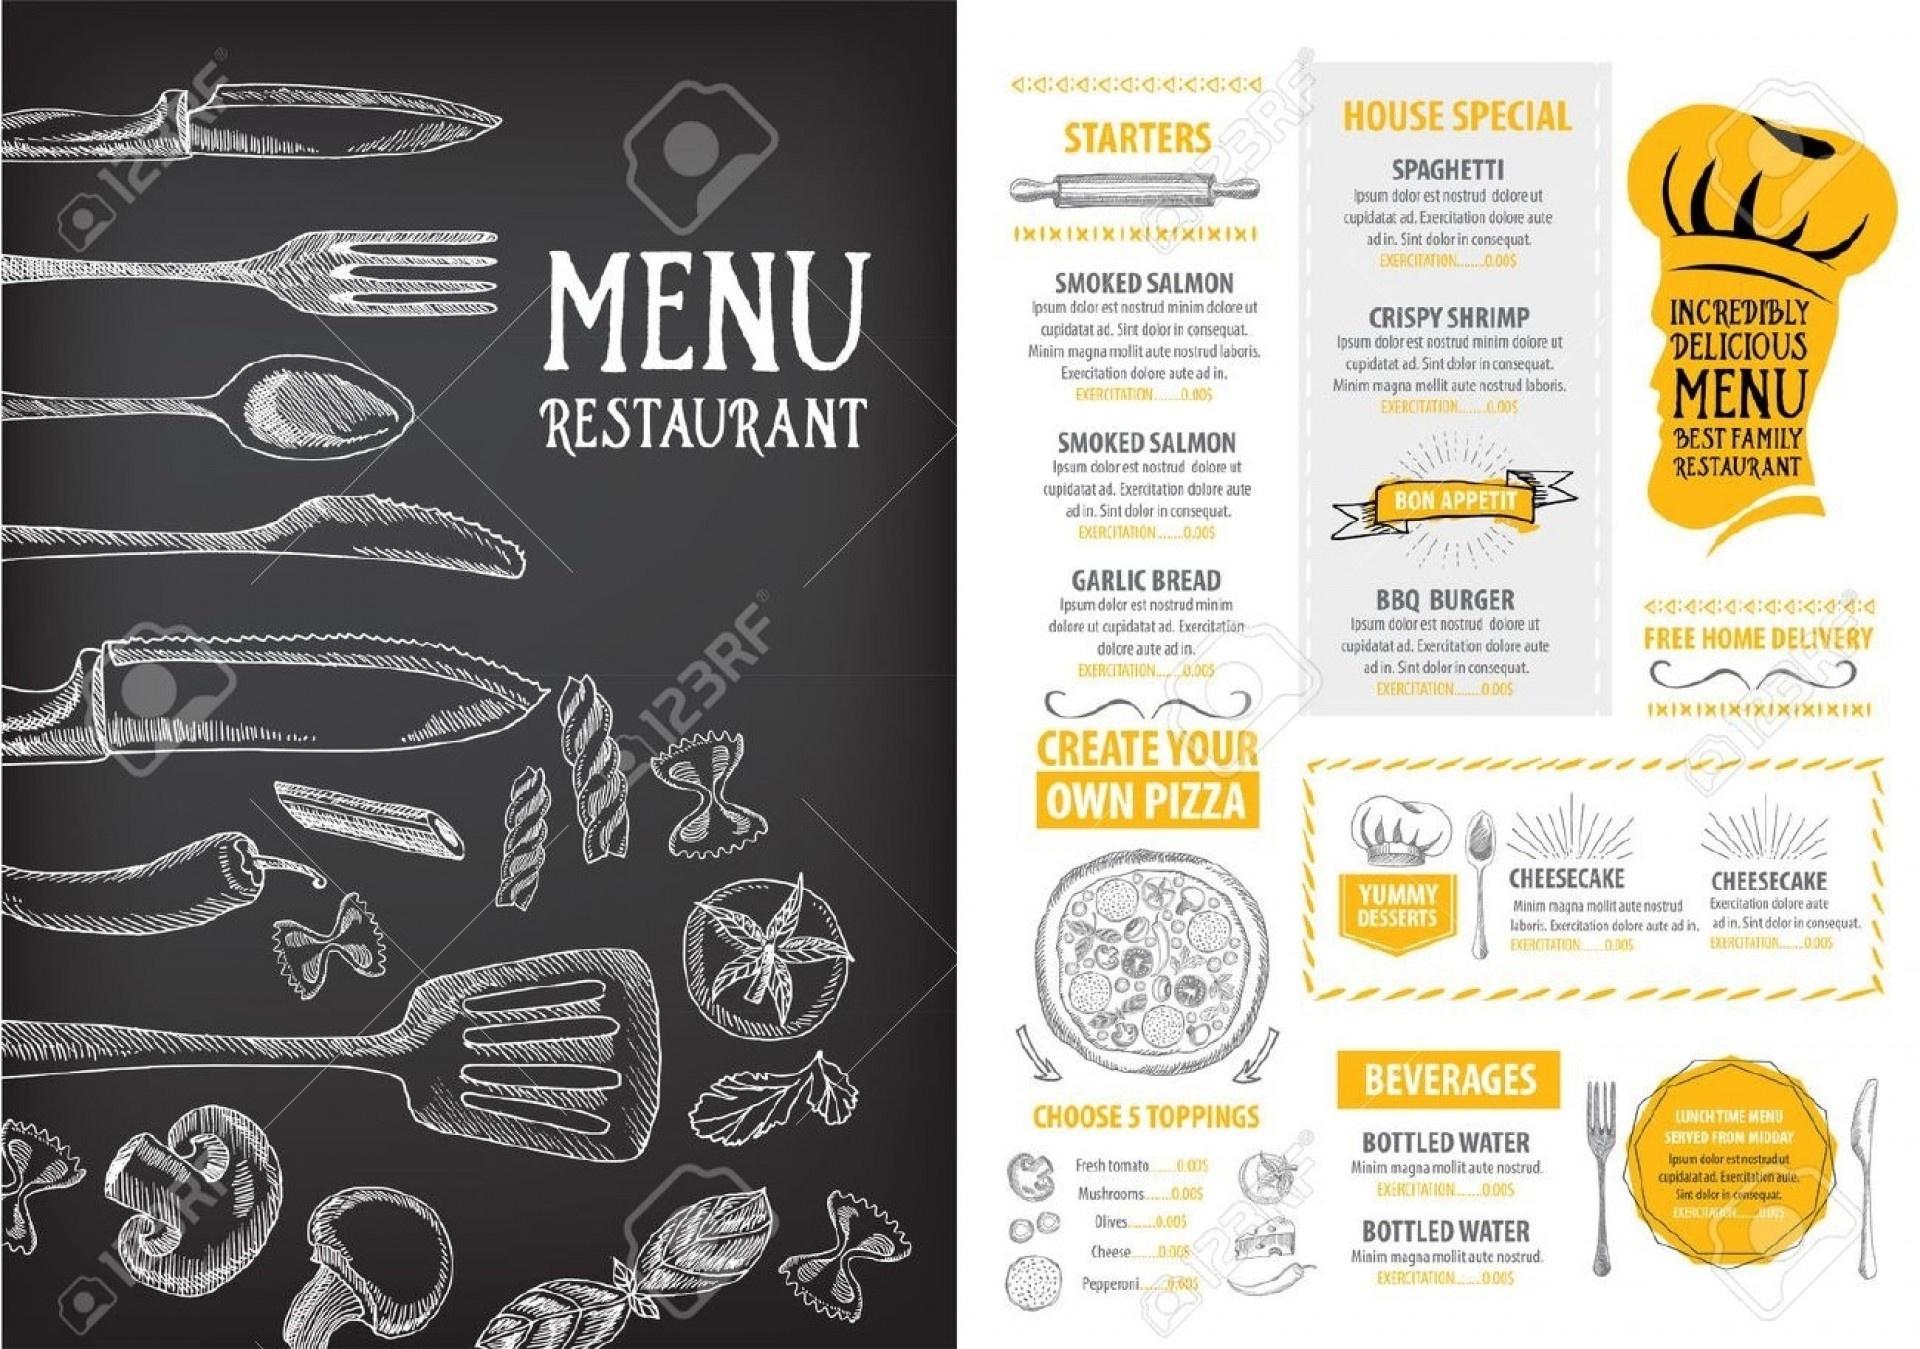 007 Free Menu Design Templates Template Printables And Charts - Design A Menu For Free Printable